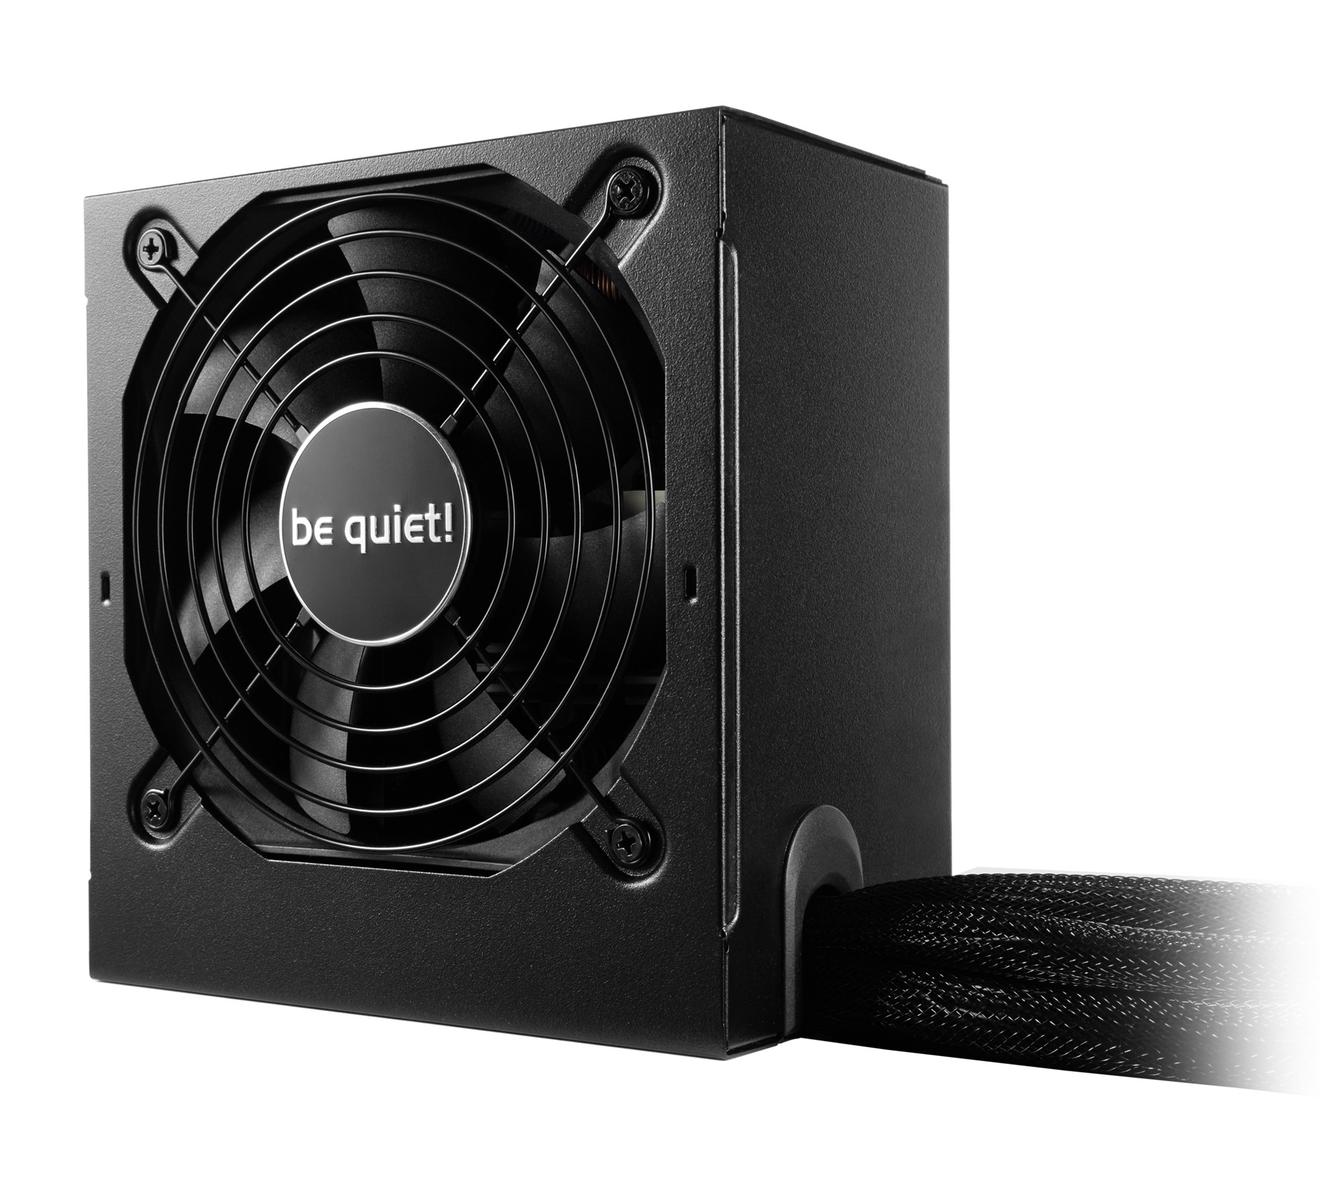 be quiet! System Power 9 400 W 80+ Bronze Certified ATX Power Supply